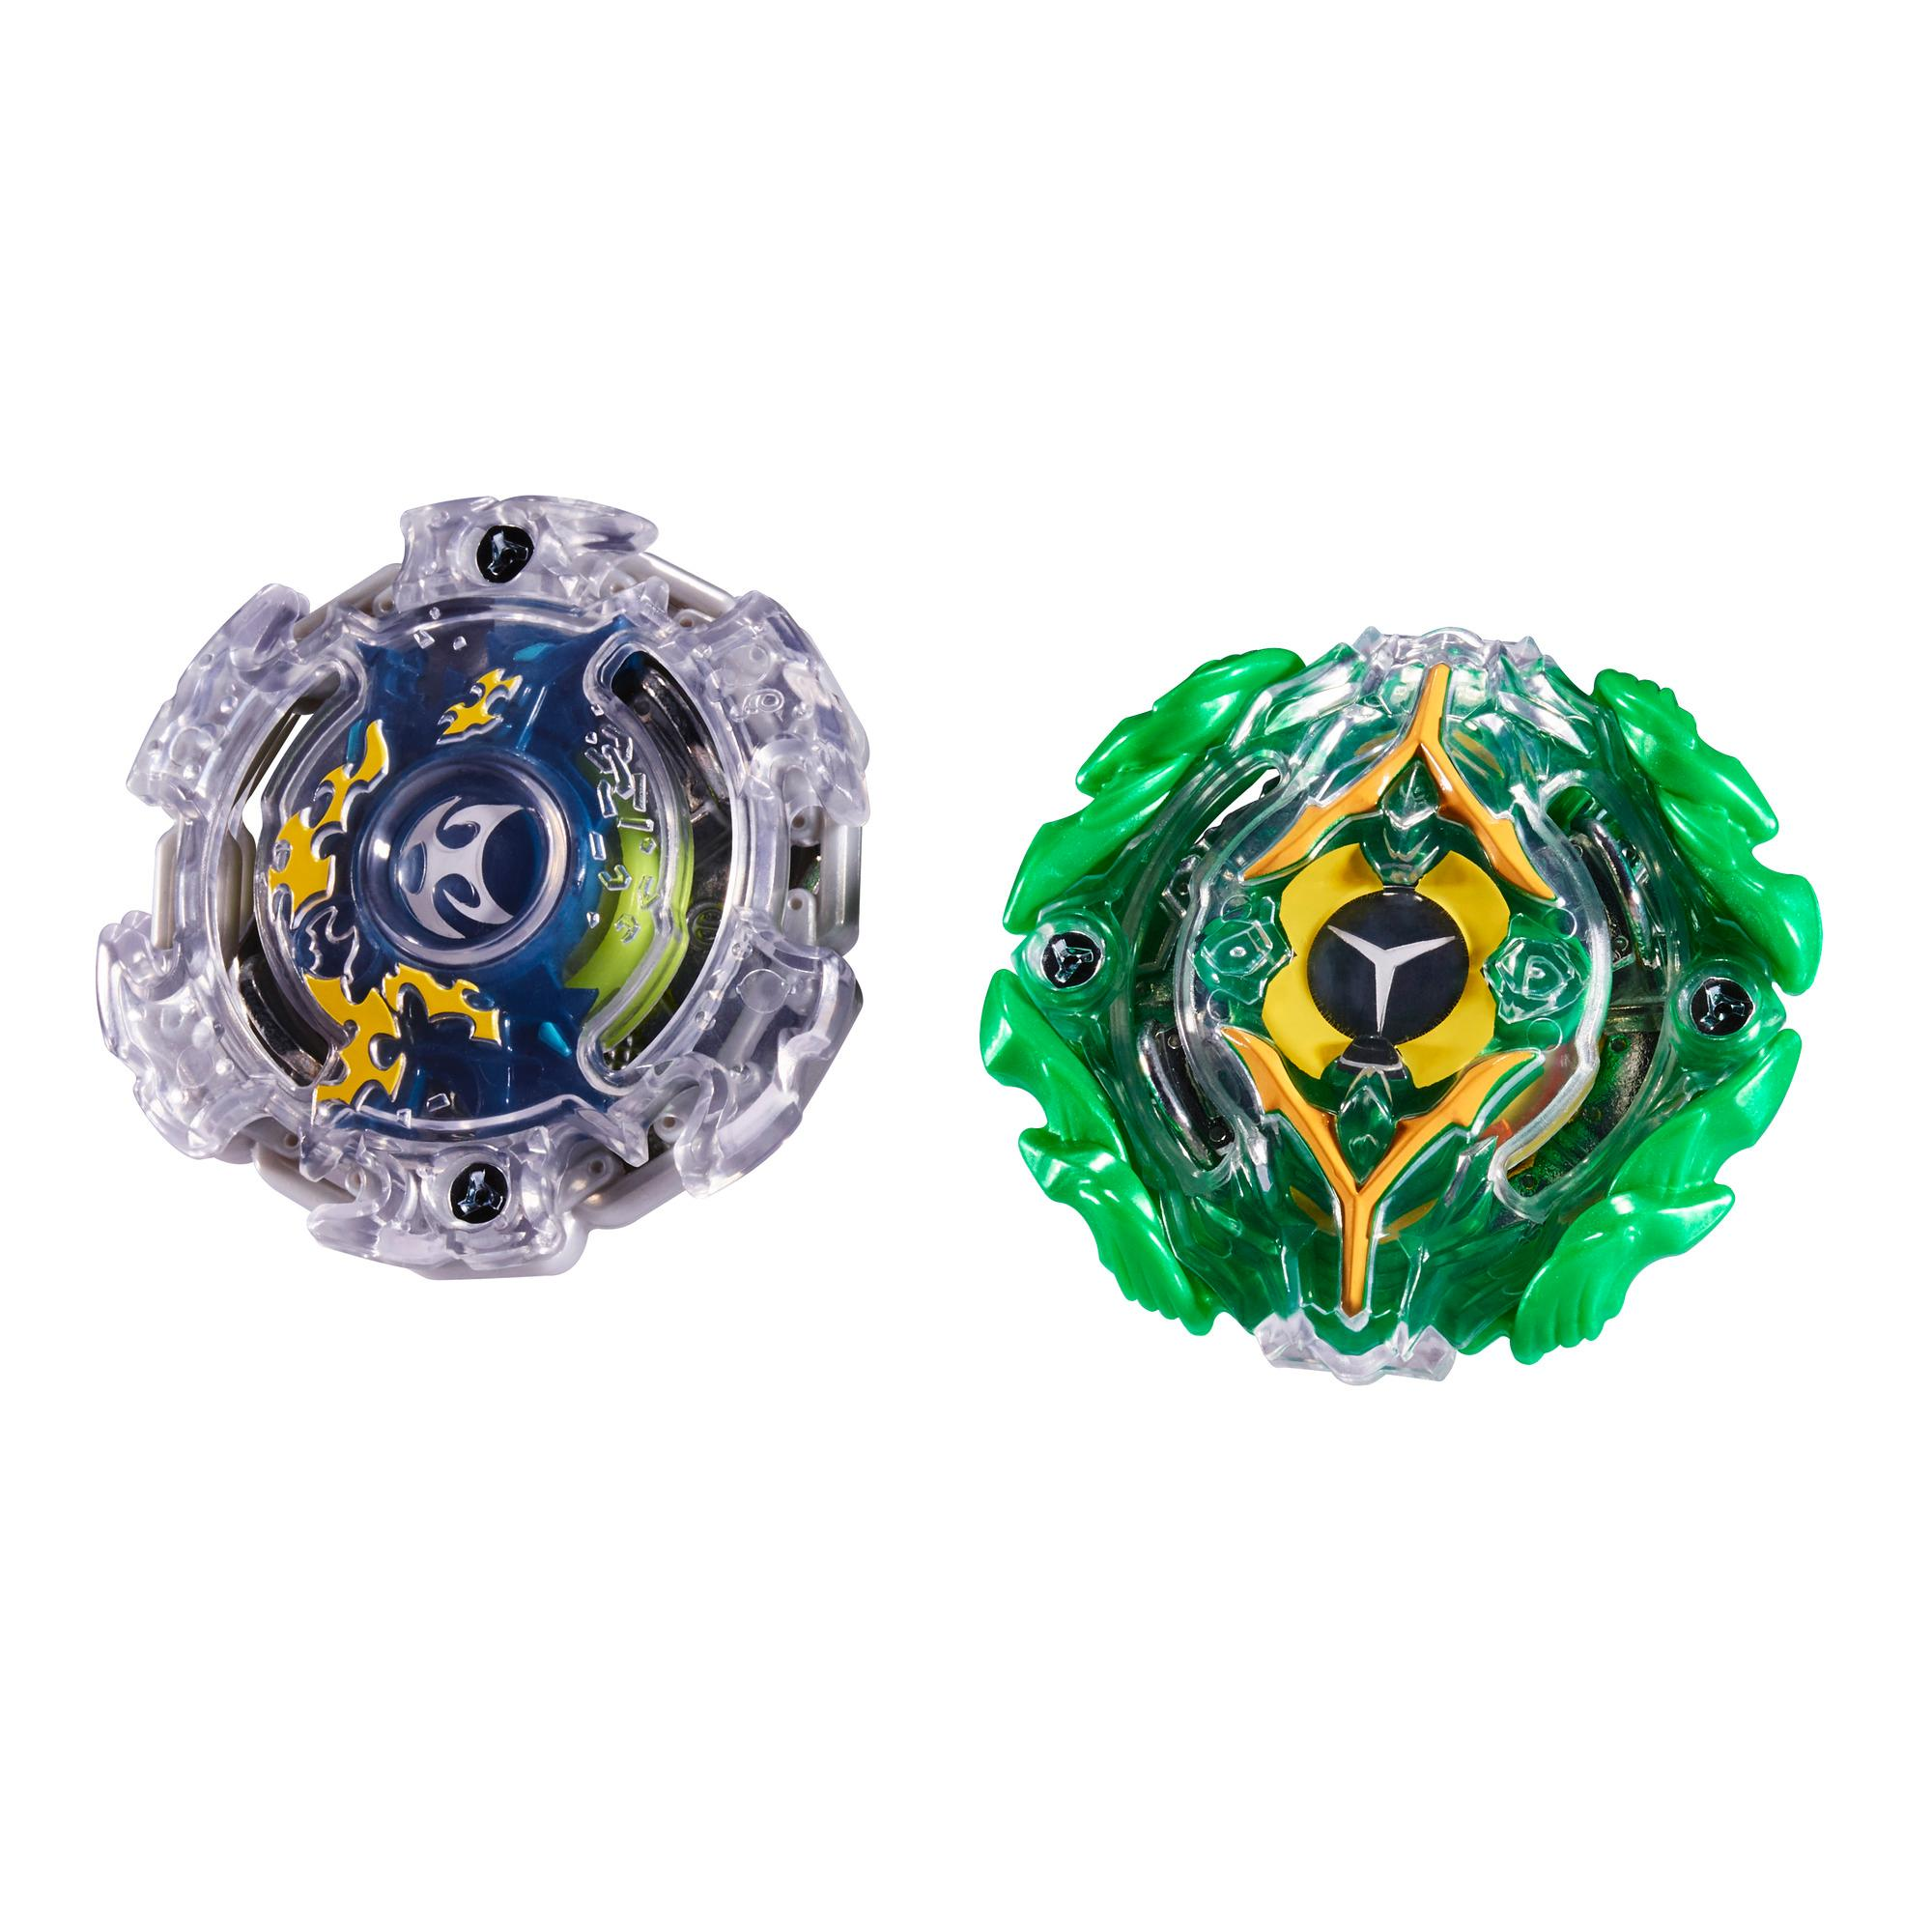 Beyblade Burst İkili Paket - Kerbeus K2 & Yegdrion Y2